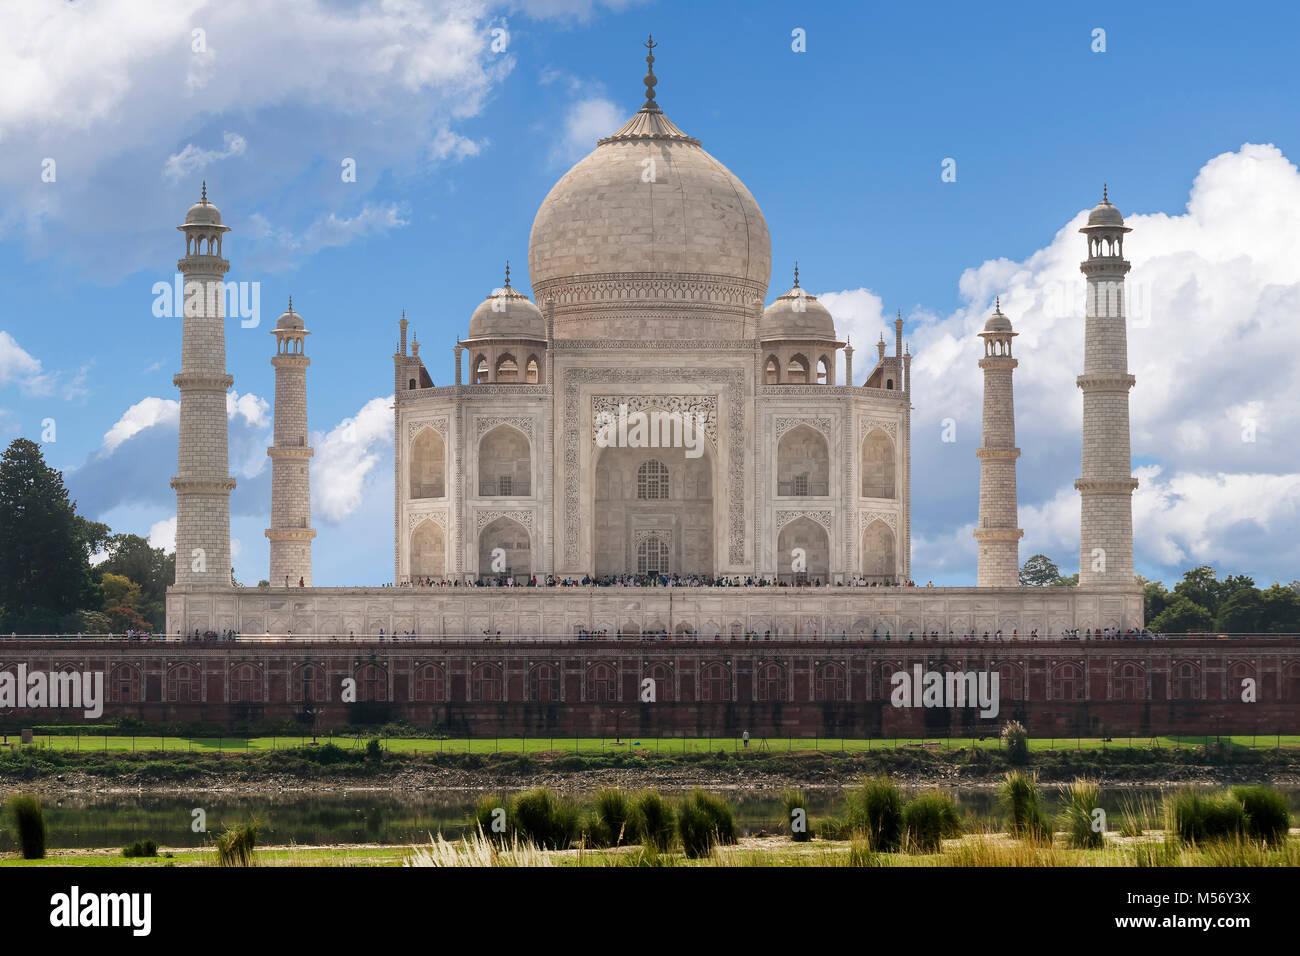 Taj Mahal Pictures Scenic Travel Photos: Beautiful Scenic Color White Famous Stock Photos